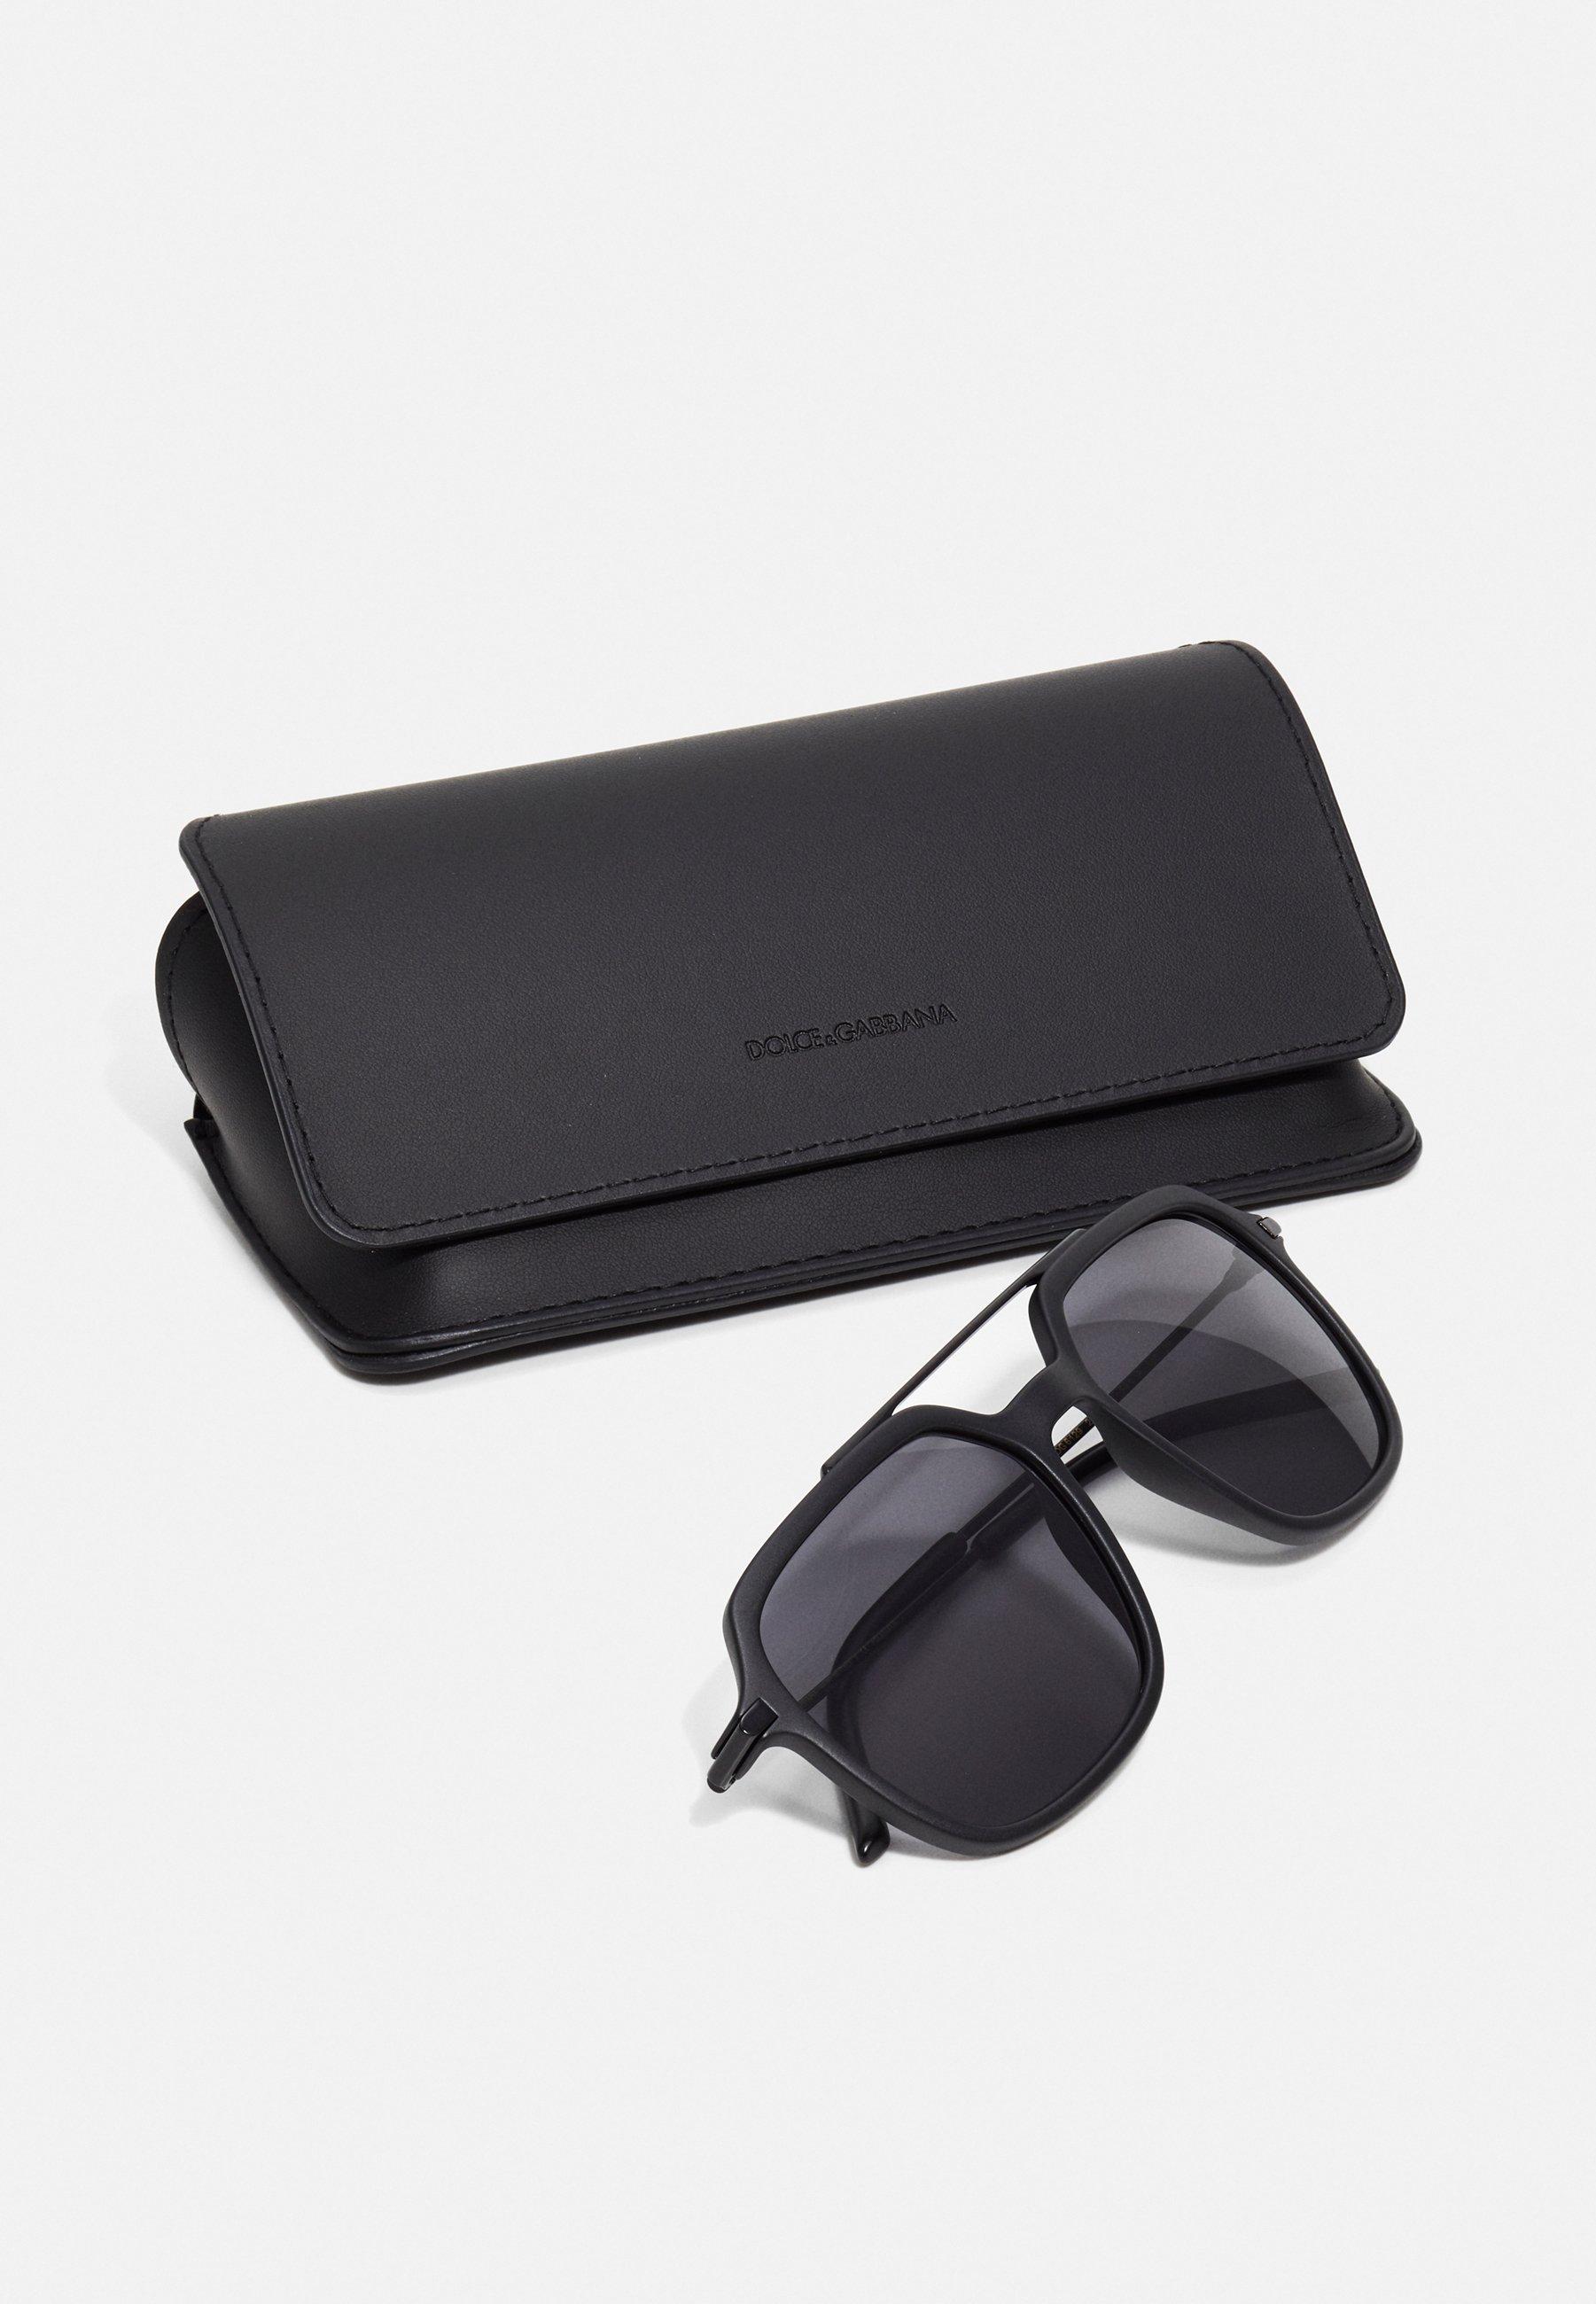 DolceGabbana Sonnenbrille - matte black/schwarz - Herrenaccessoires peXlO